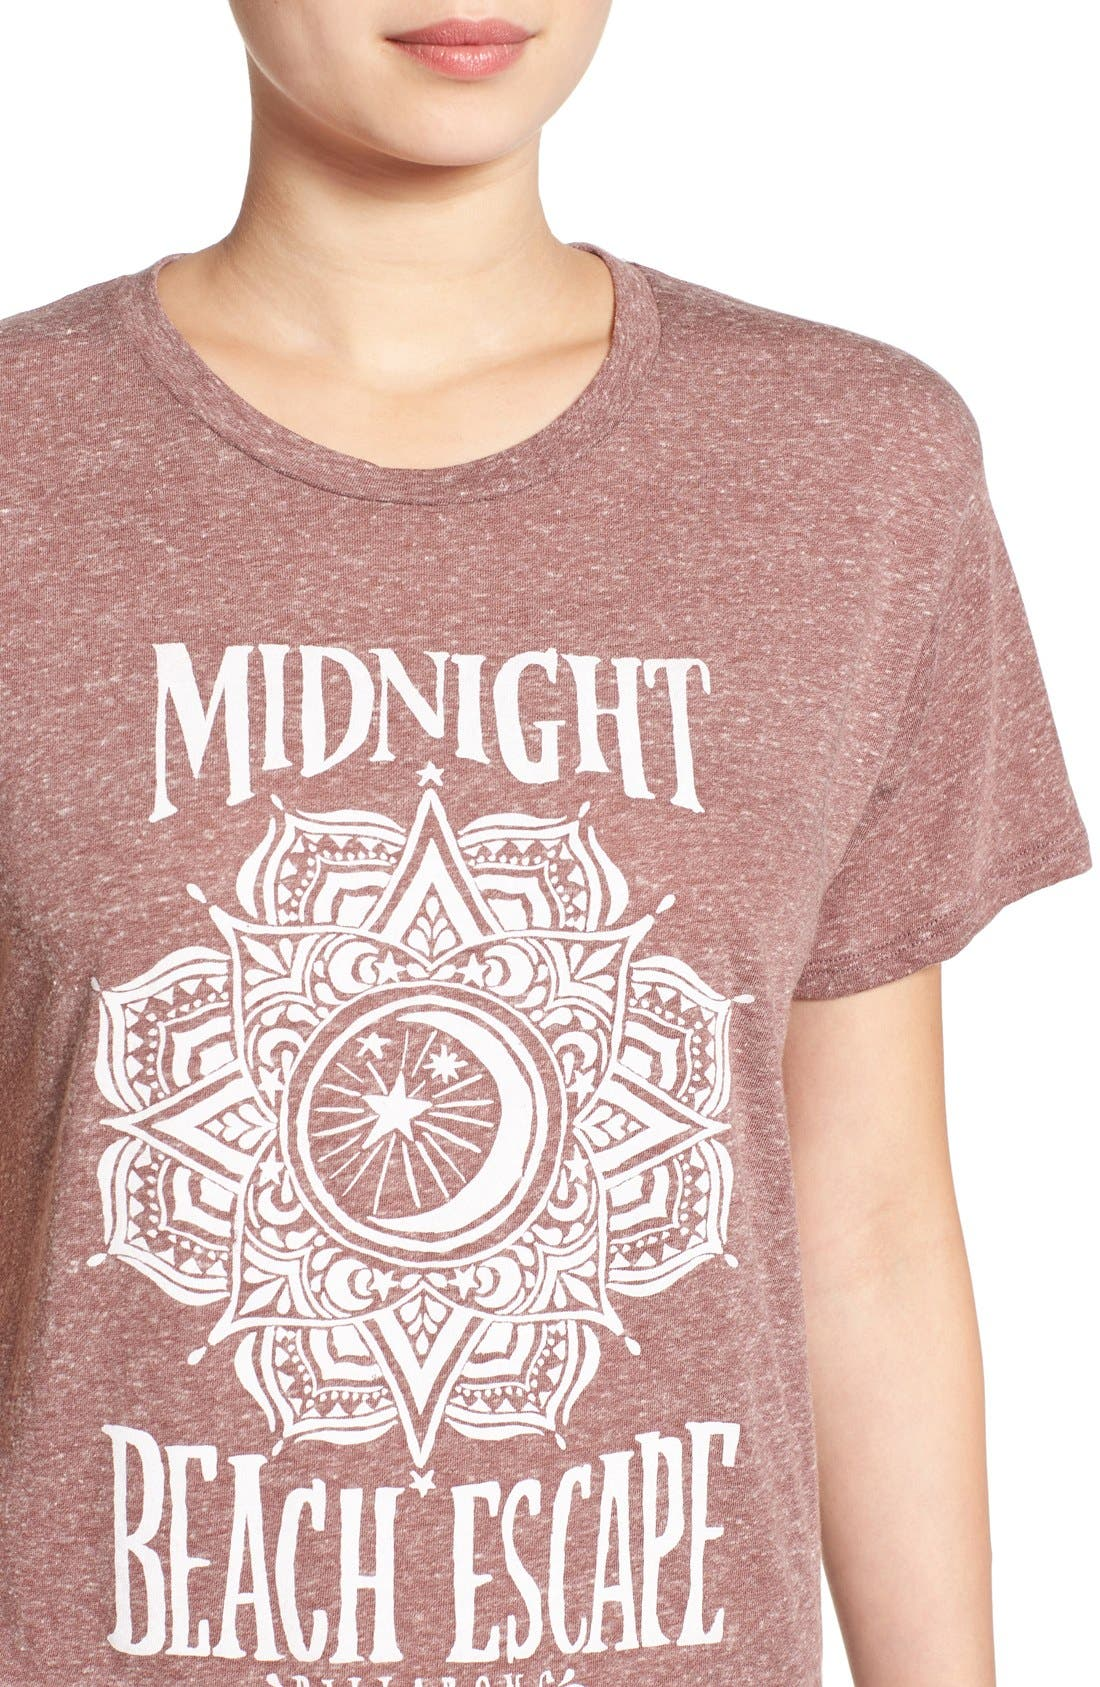 'Midnight Escape' Graphic Tee,                             Alternate thumbnail 4, color,                             Mauve Wood